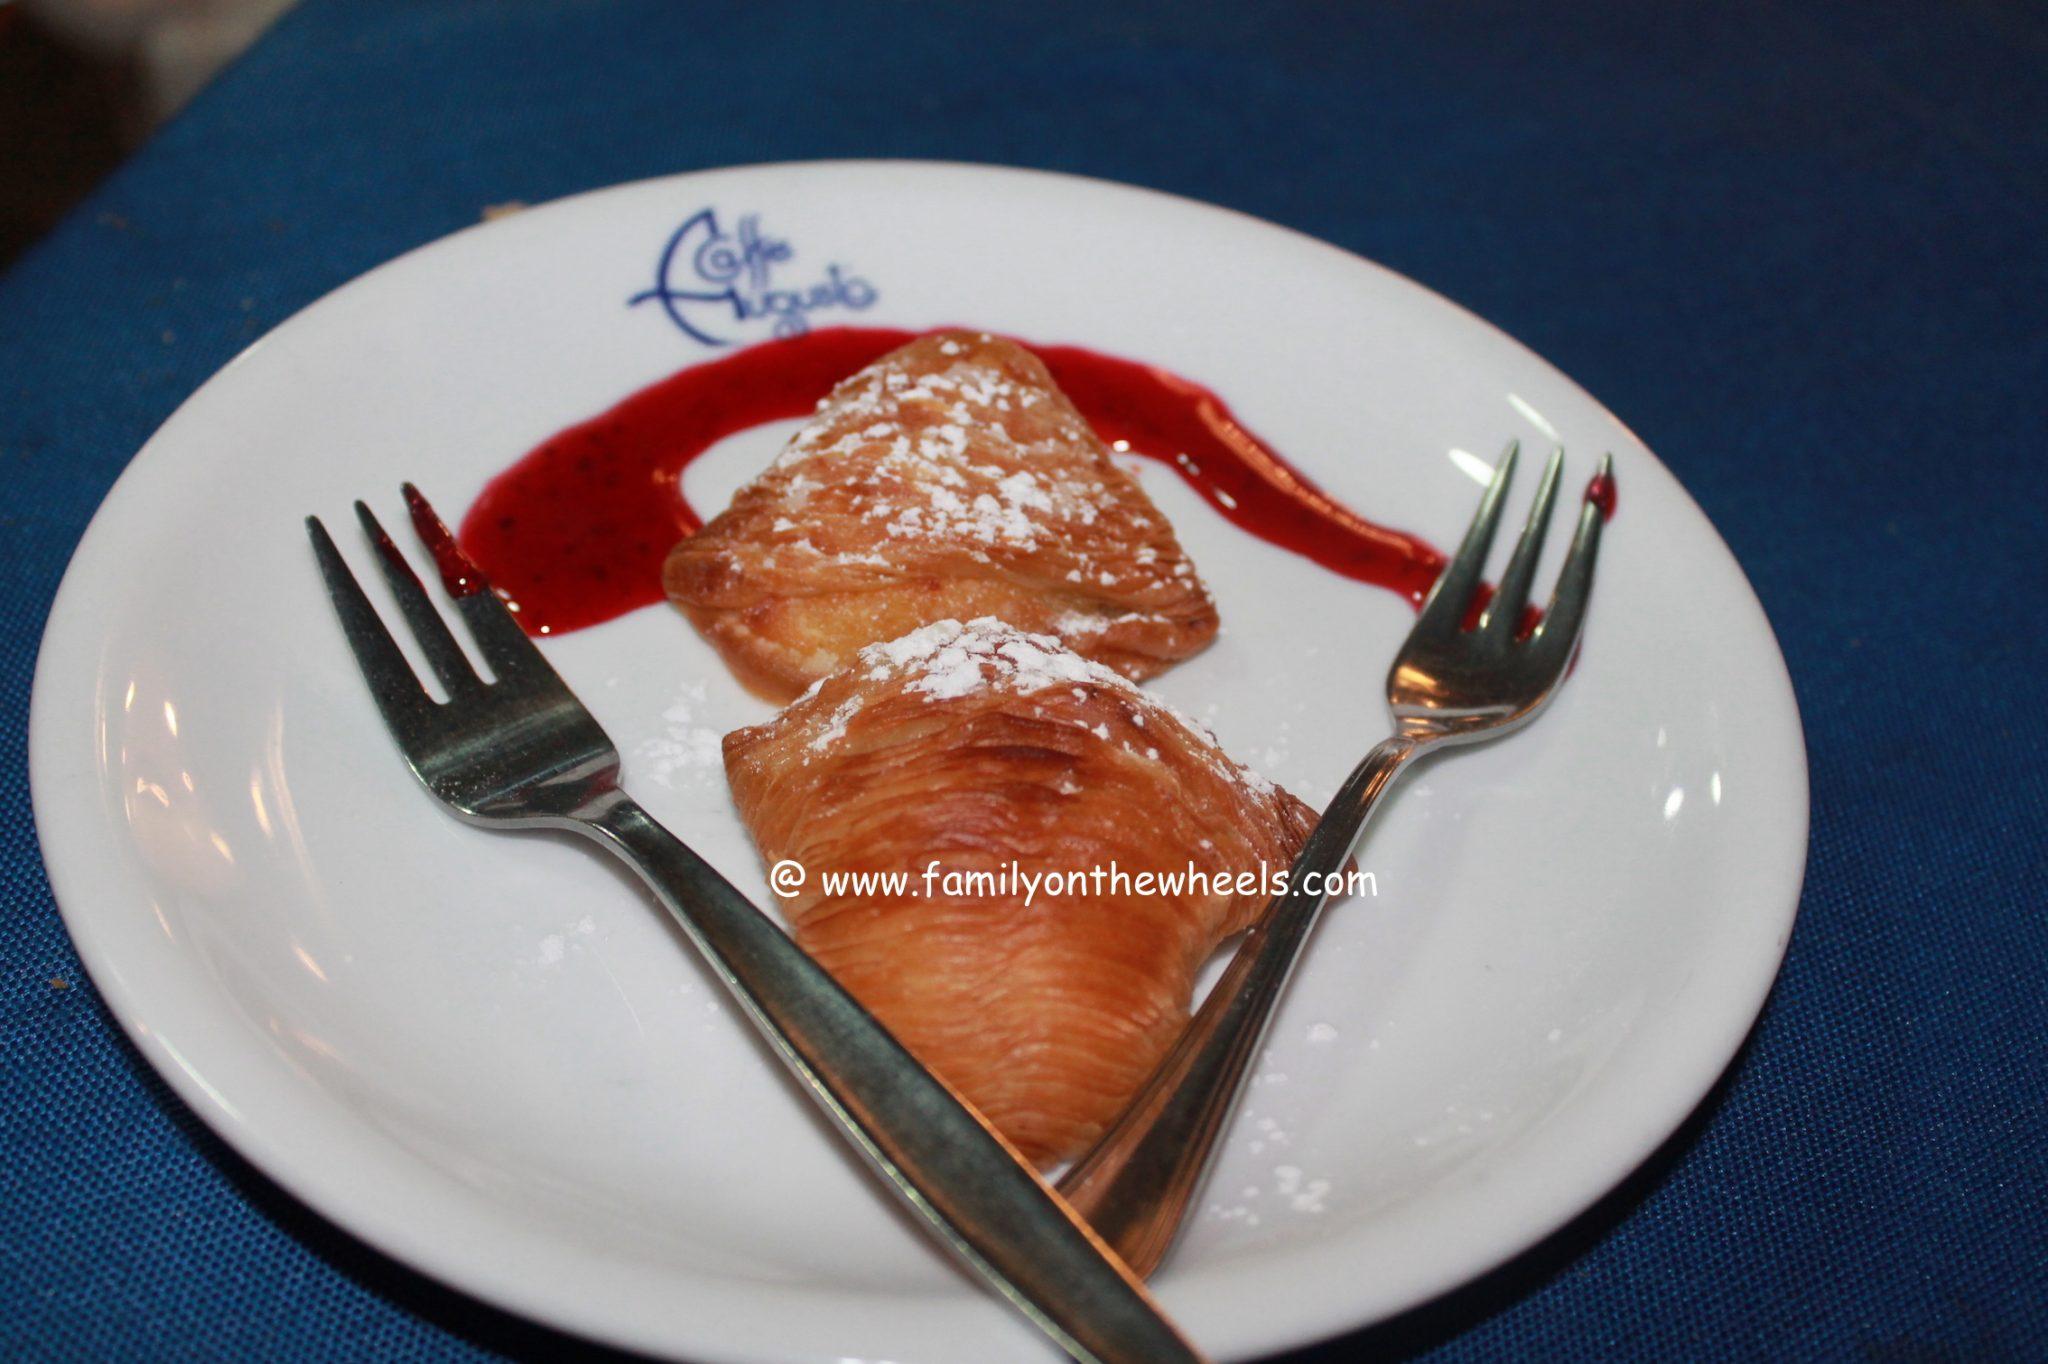 Napoletan dessert - Sfogliatella